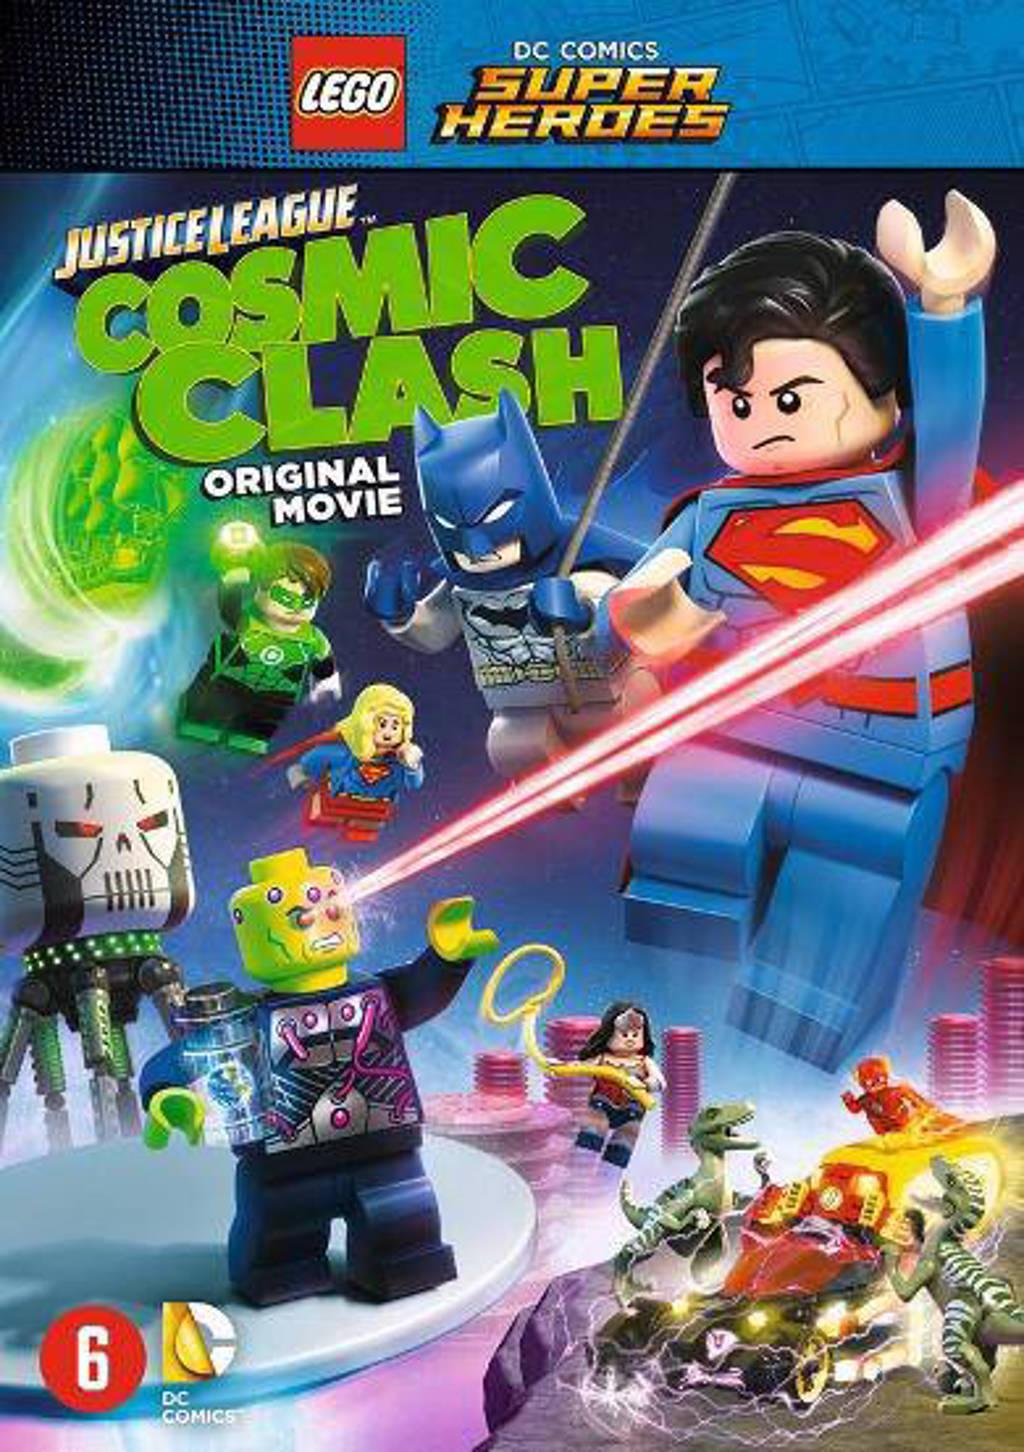 Lego DC super heroes - Justice league cosmic clash (DVD)